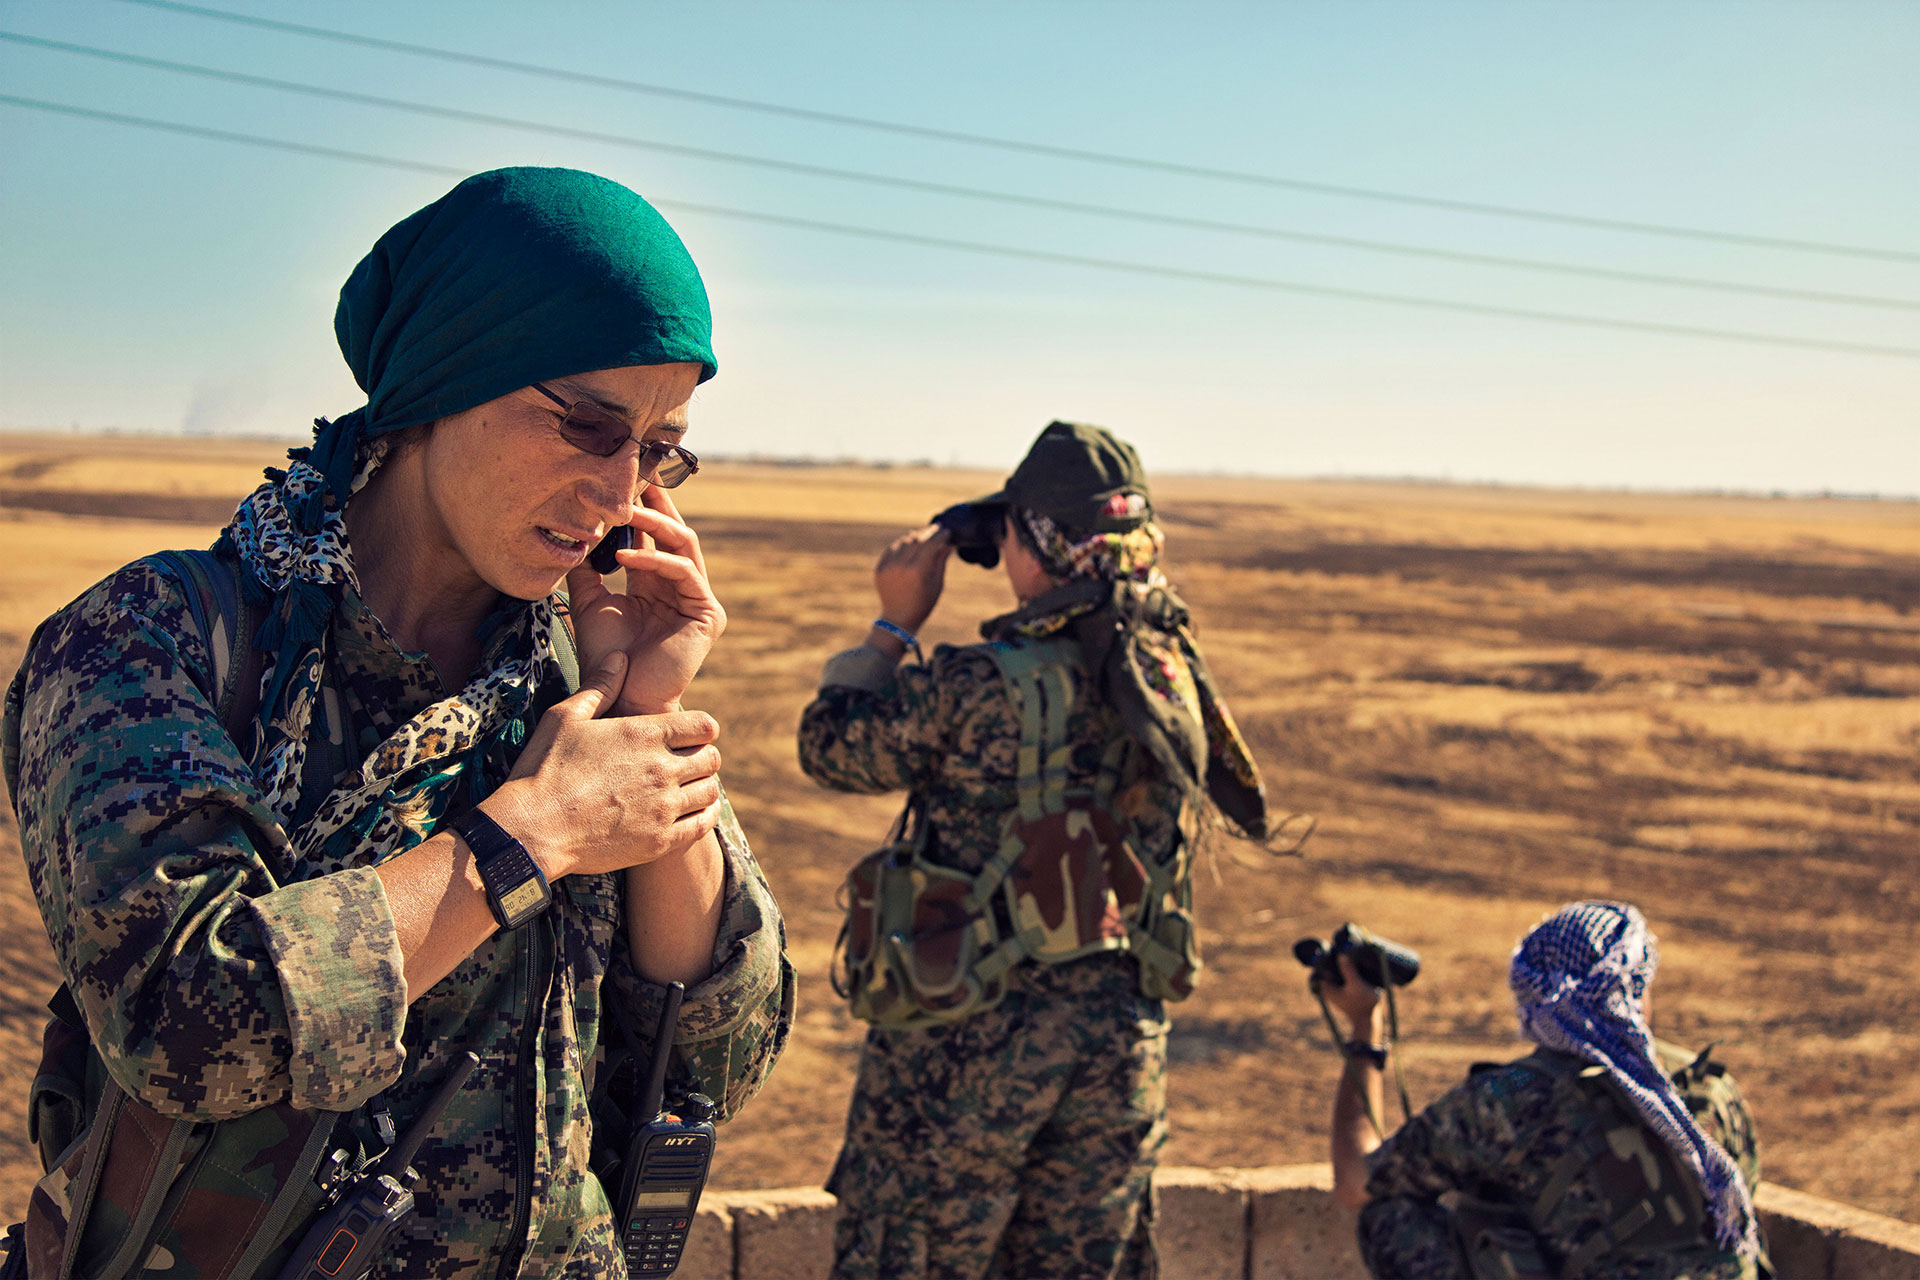 COMMANDER ARIAN: A STORY OF WOMEN, WAR & FREEDOM